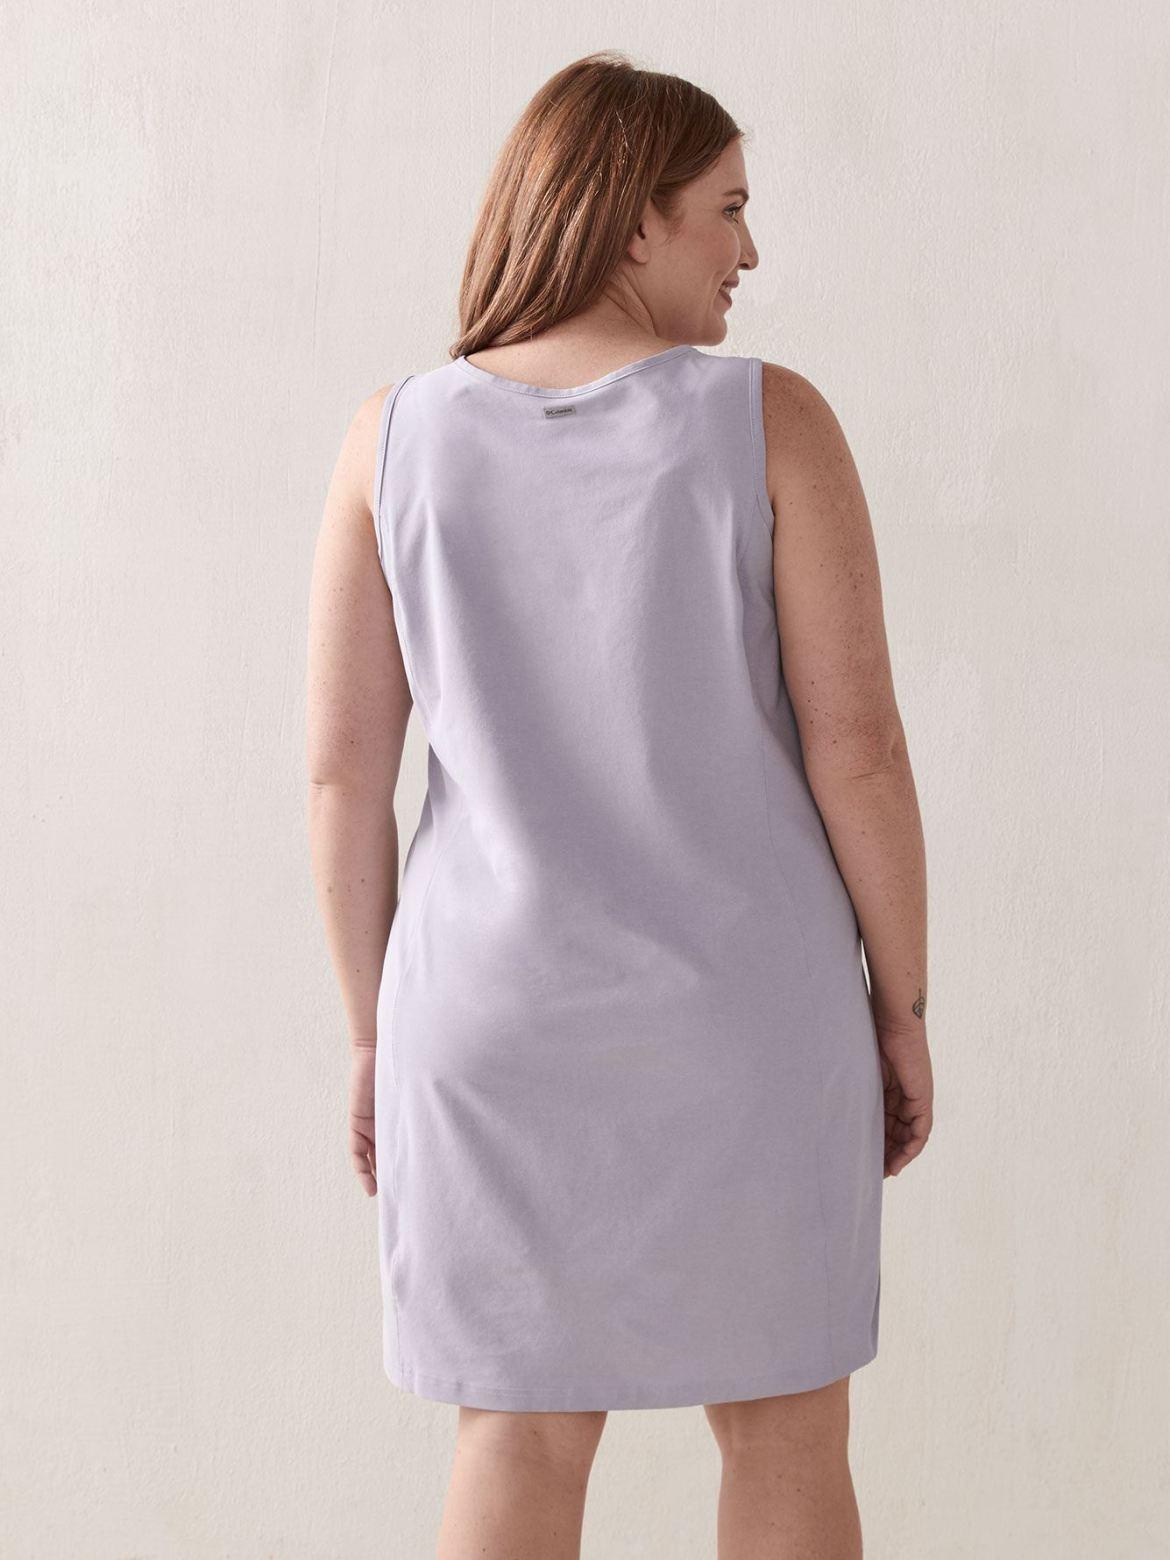 Sleeveless Anytime Casual III Dress - Columbia